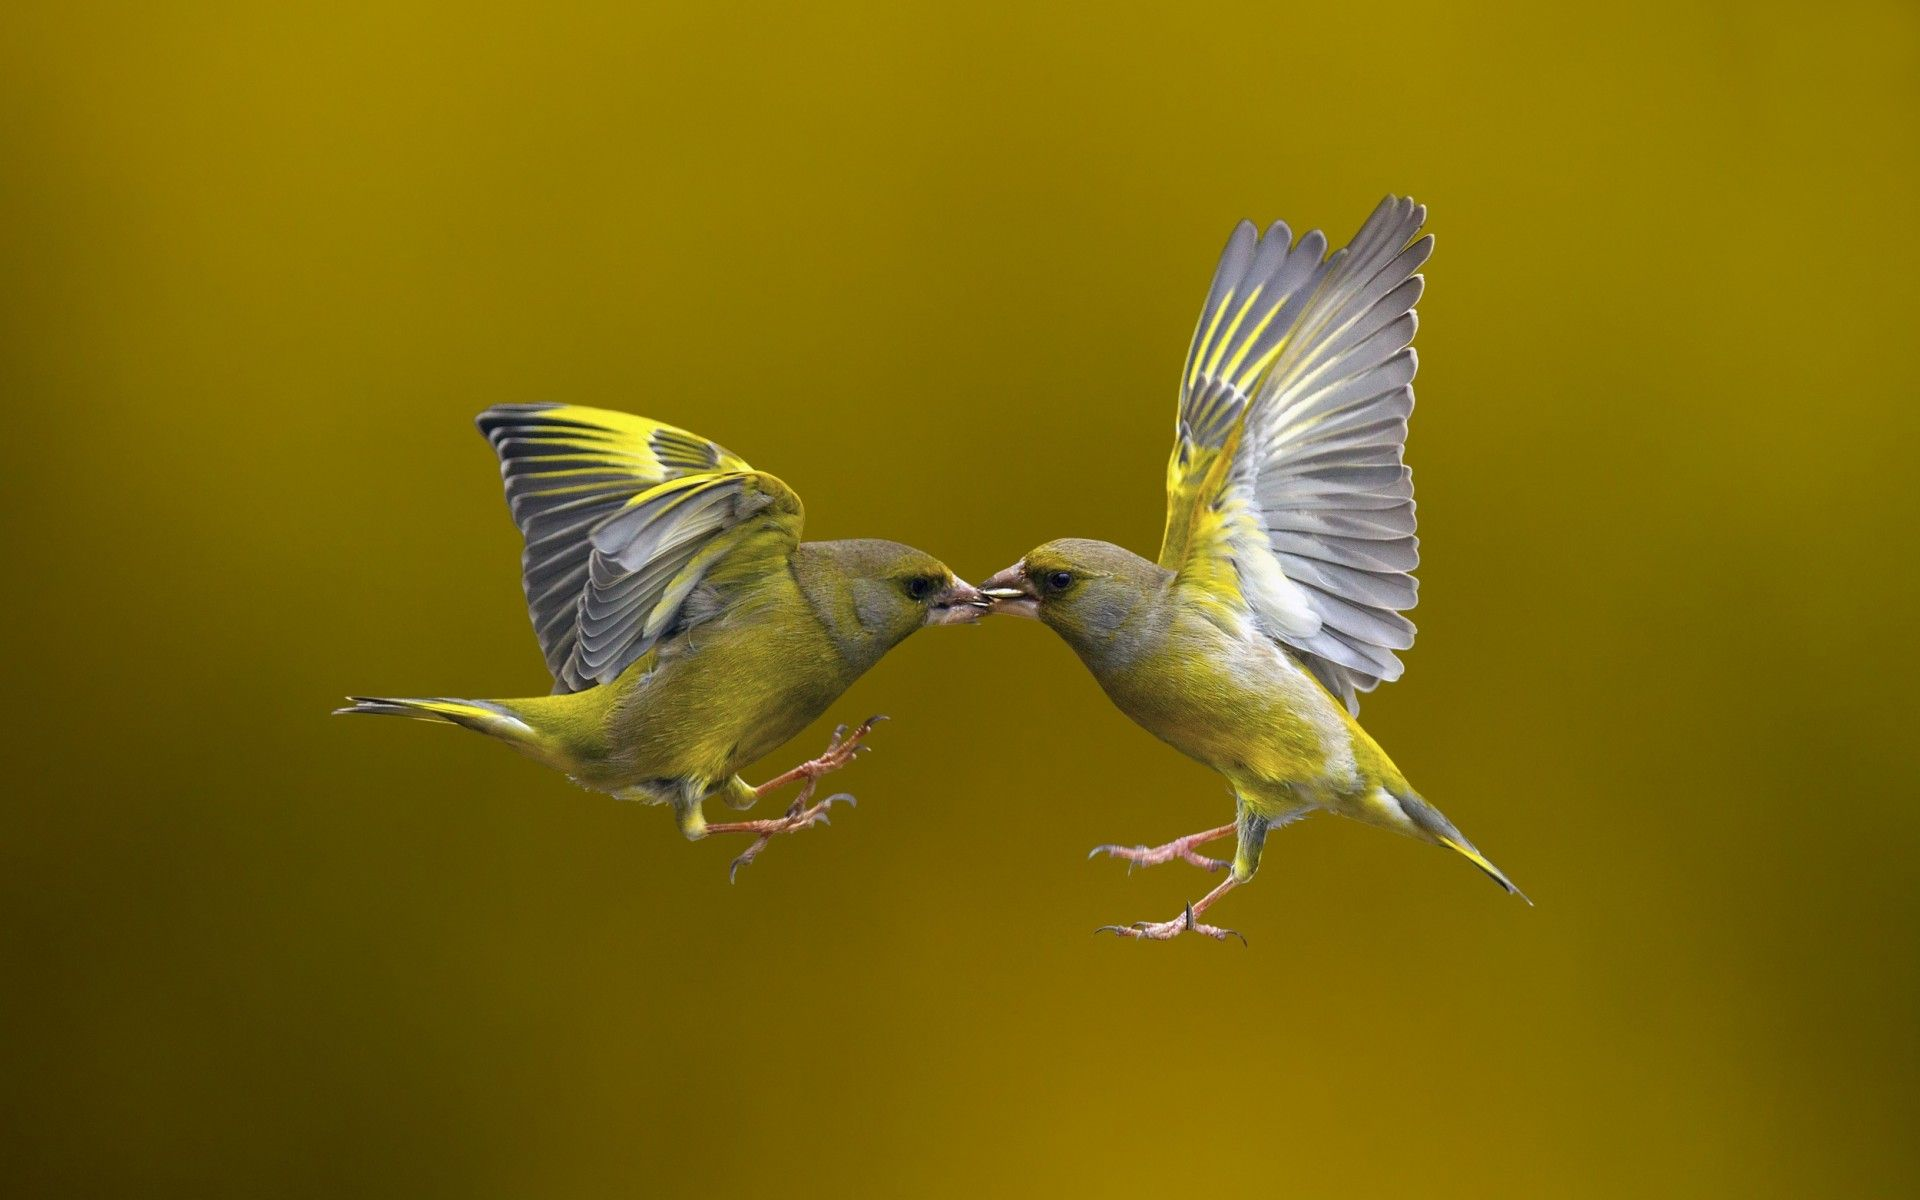 Animal Bird Wallpaper (With images) Shutter speed, Birds